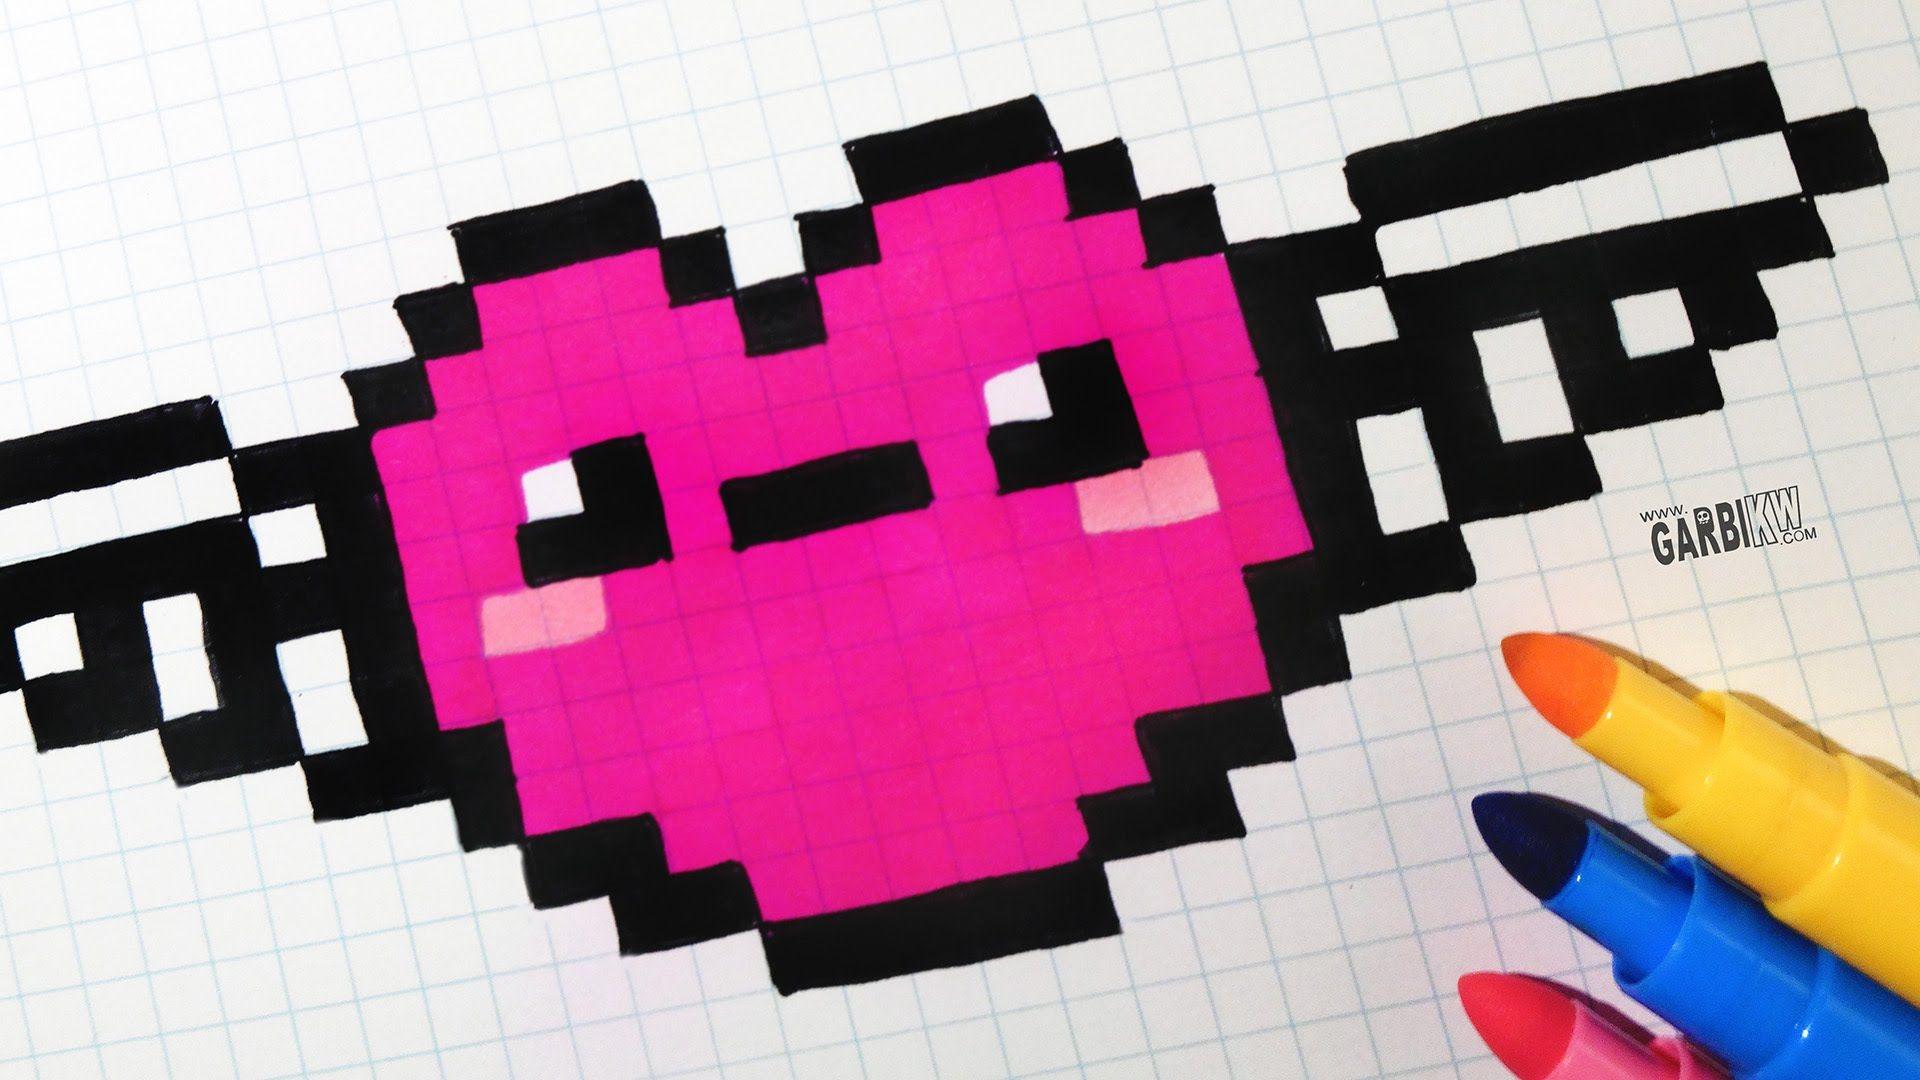 Handmade Pixel Art How To Draw Kawaii Heart With Wings